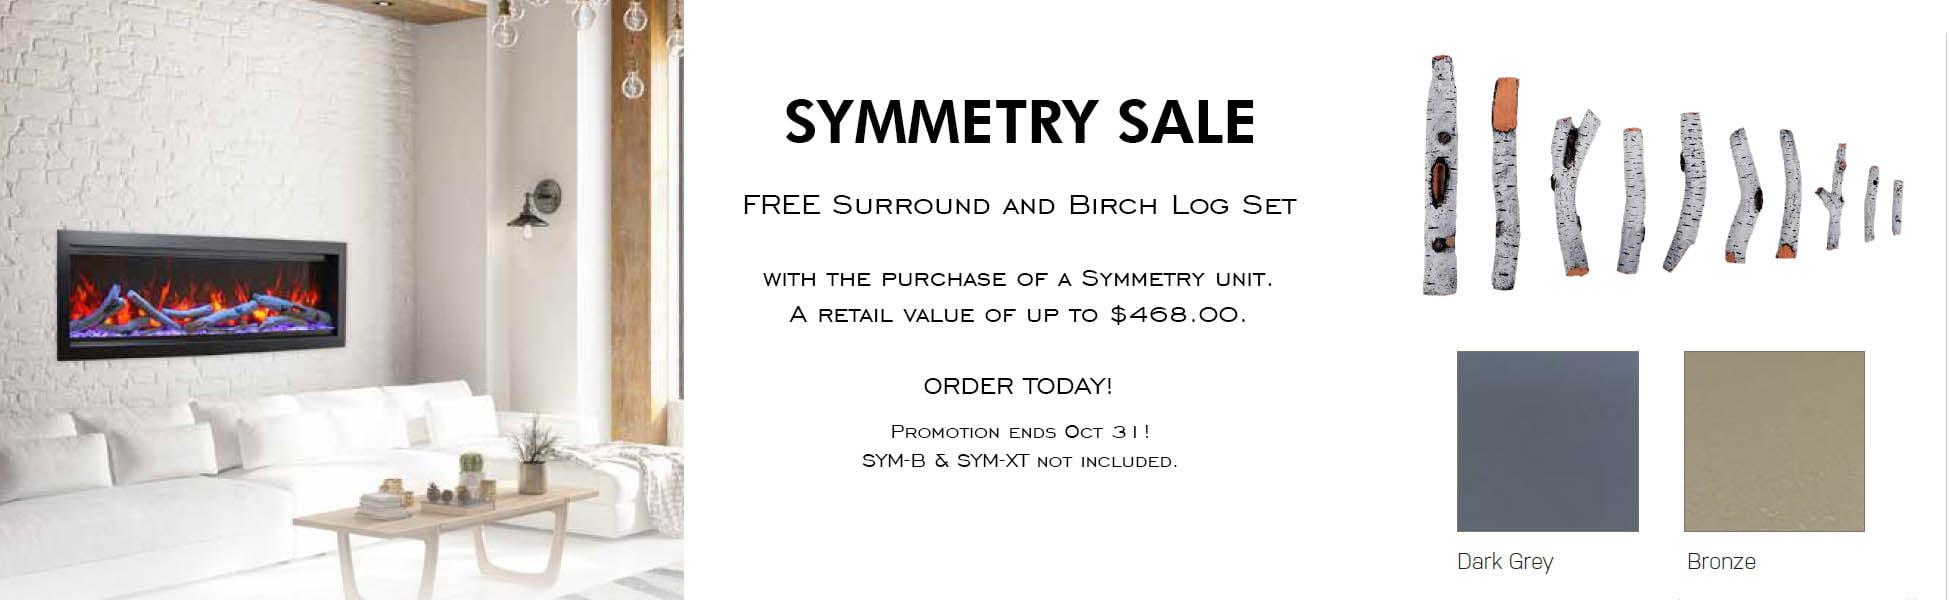 Symmetry promotion